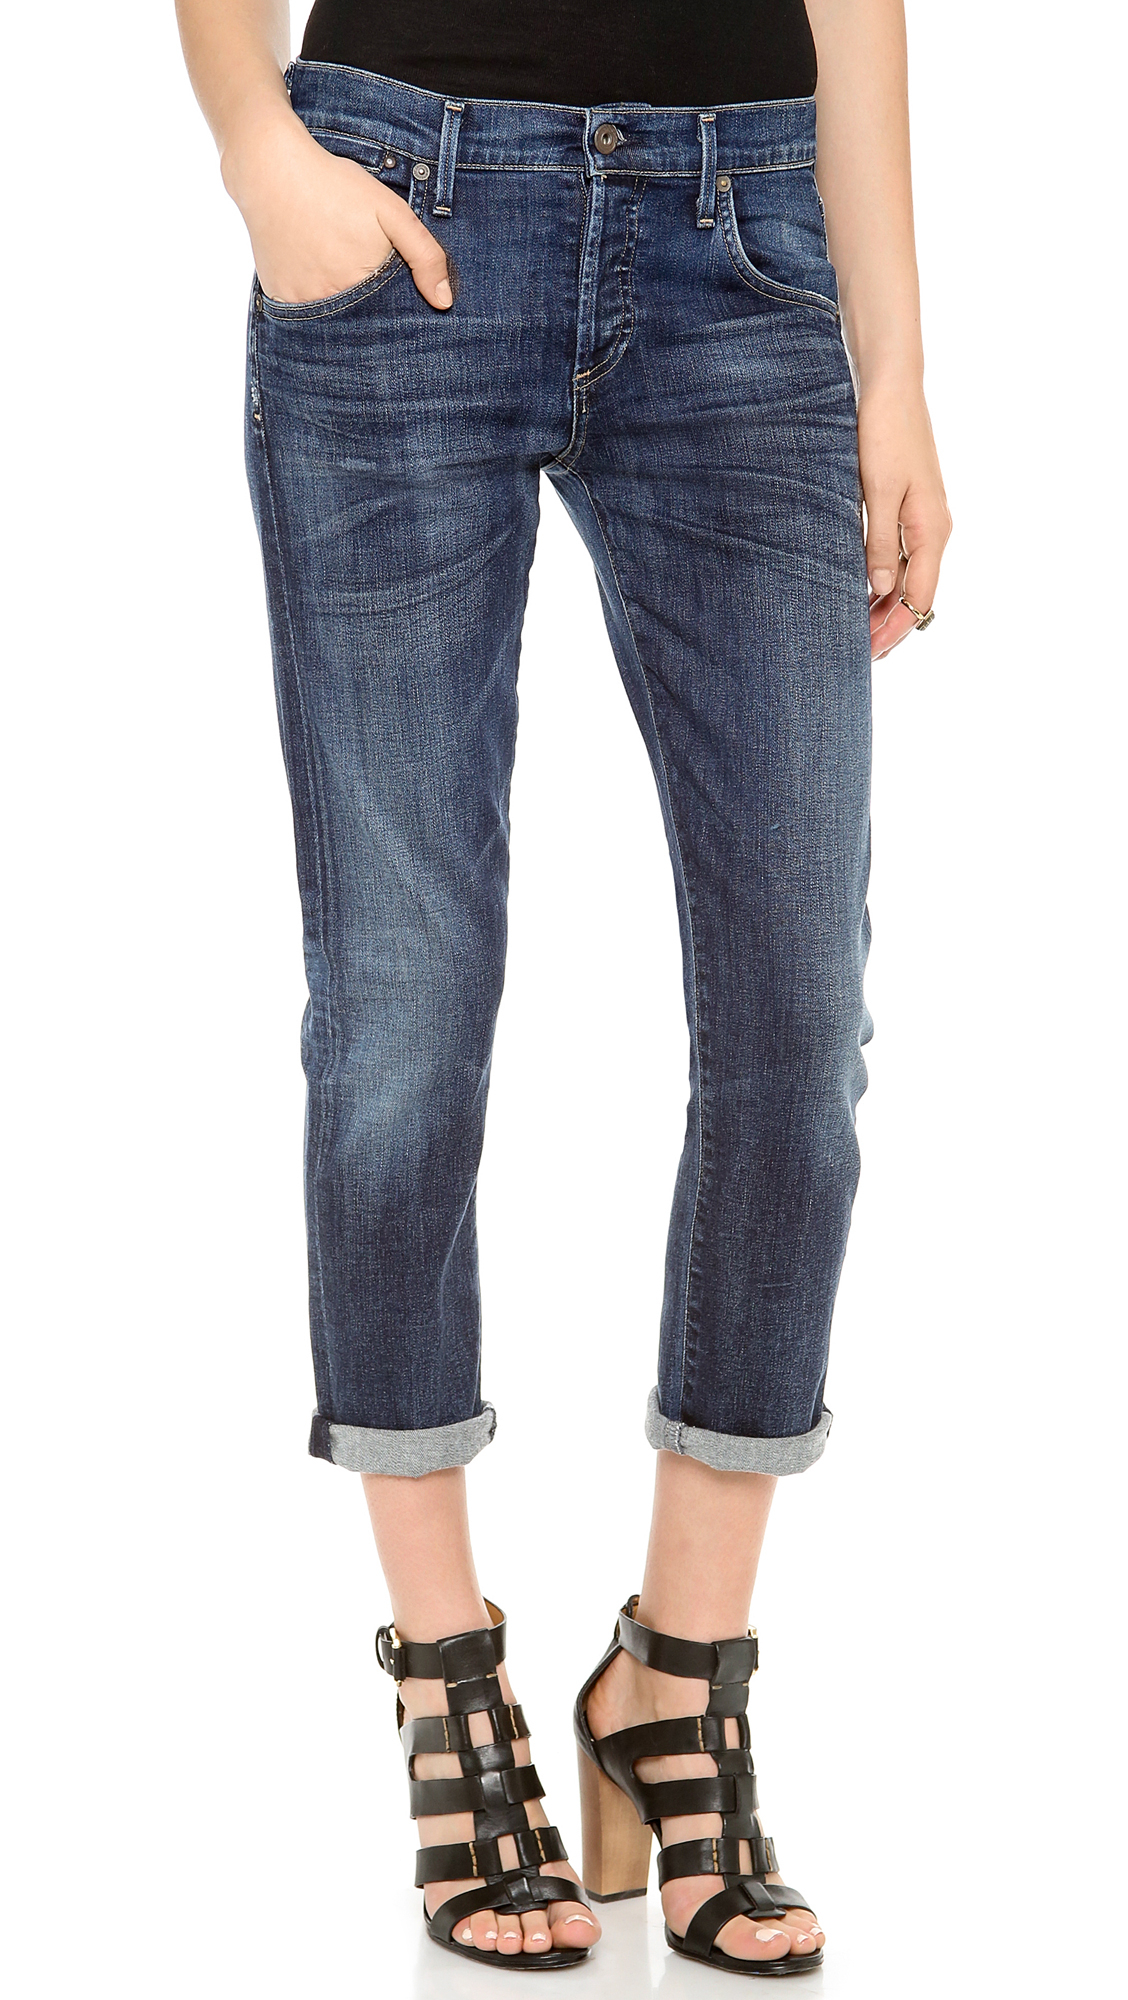 Citizens Of Humanity Premium Vintage Emerson Slim Bf Jeans - Blue Ridge in Blue (Blue Ridge) | Lyst